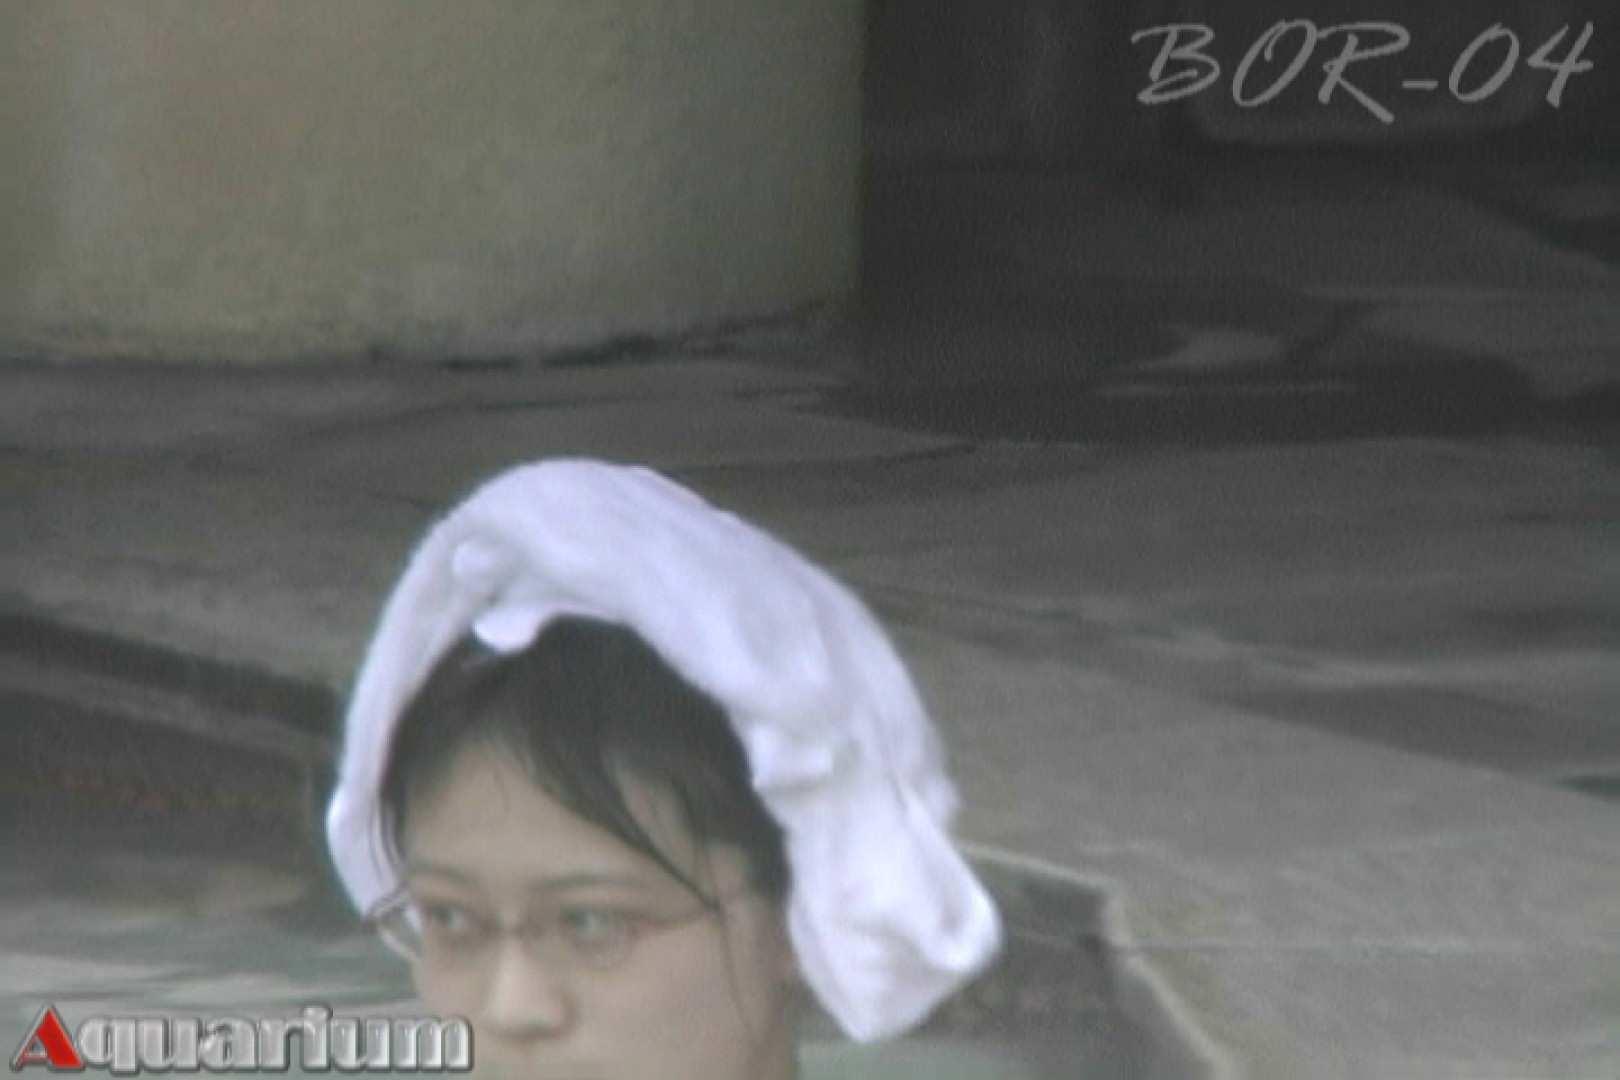 Aquaな露天風呂Vol.507 OLセックス  84画像 42